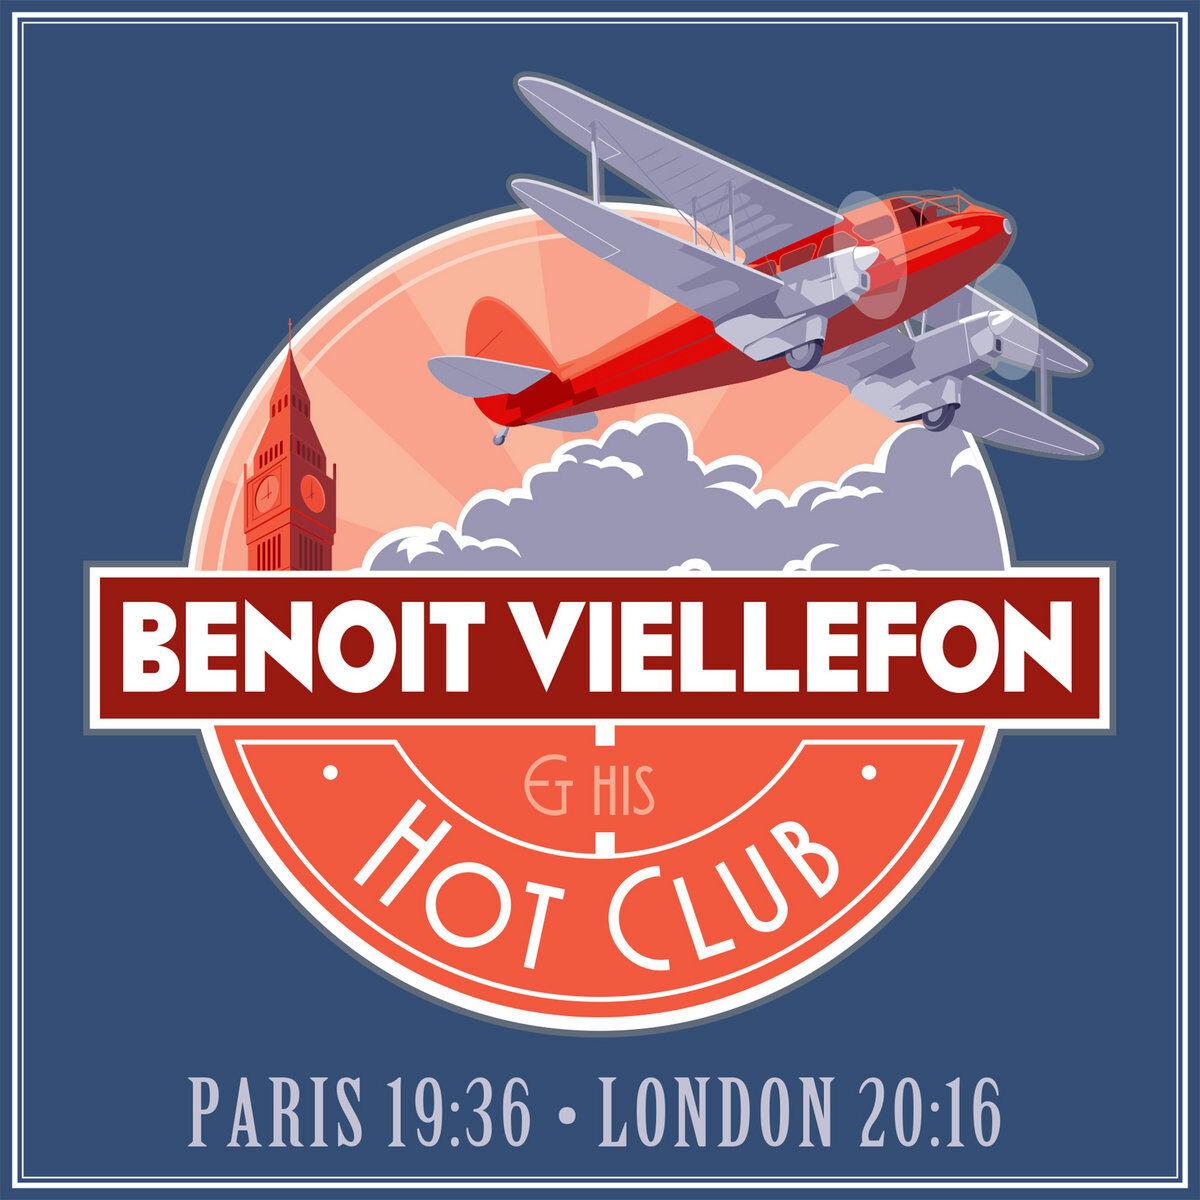 Benoit Viellefon Paris 19:36 - London 20:16